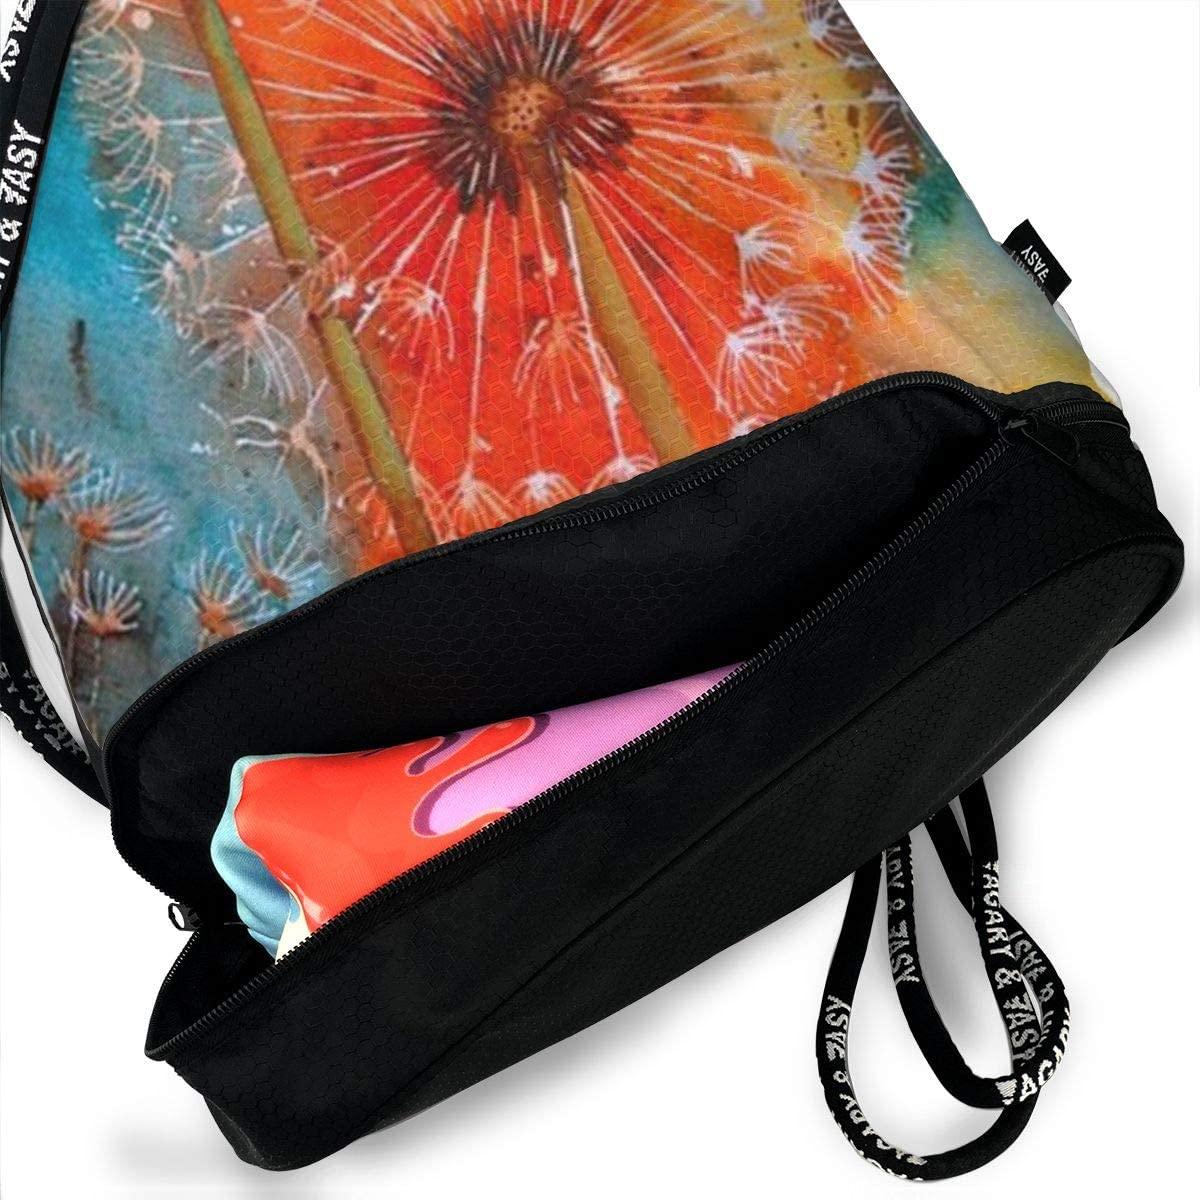 Lightweight Waterproof Large Storage Drawstring Bag For Men /& Women Watercolor Dandelion Cinch Backpack Sackpack Tote Sack